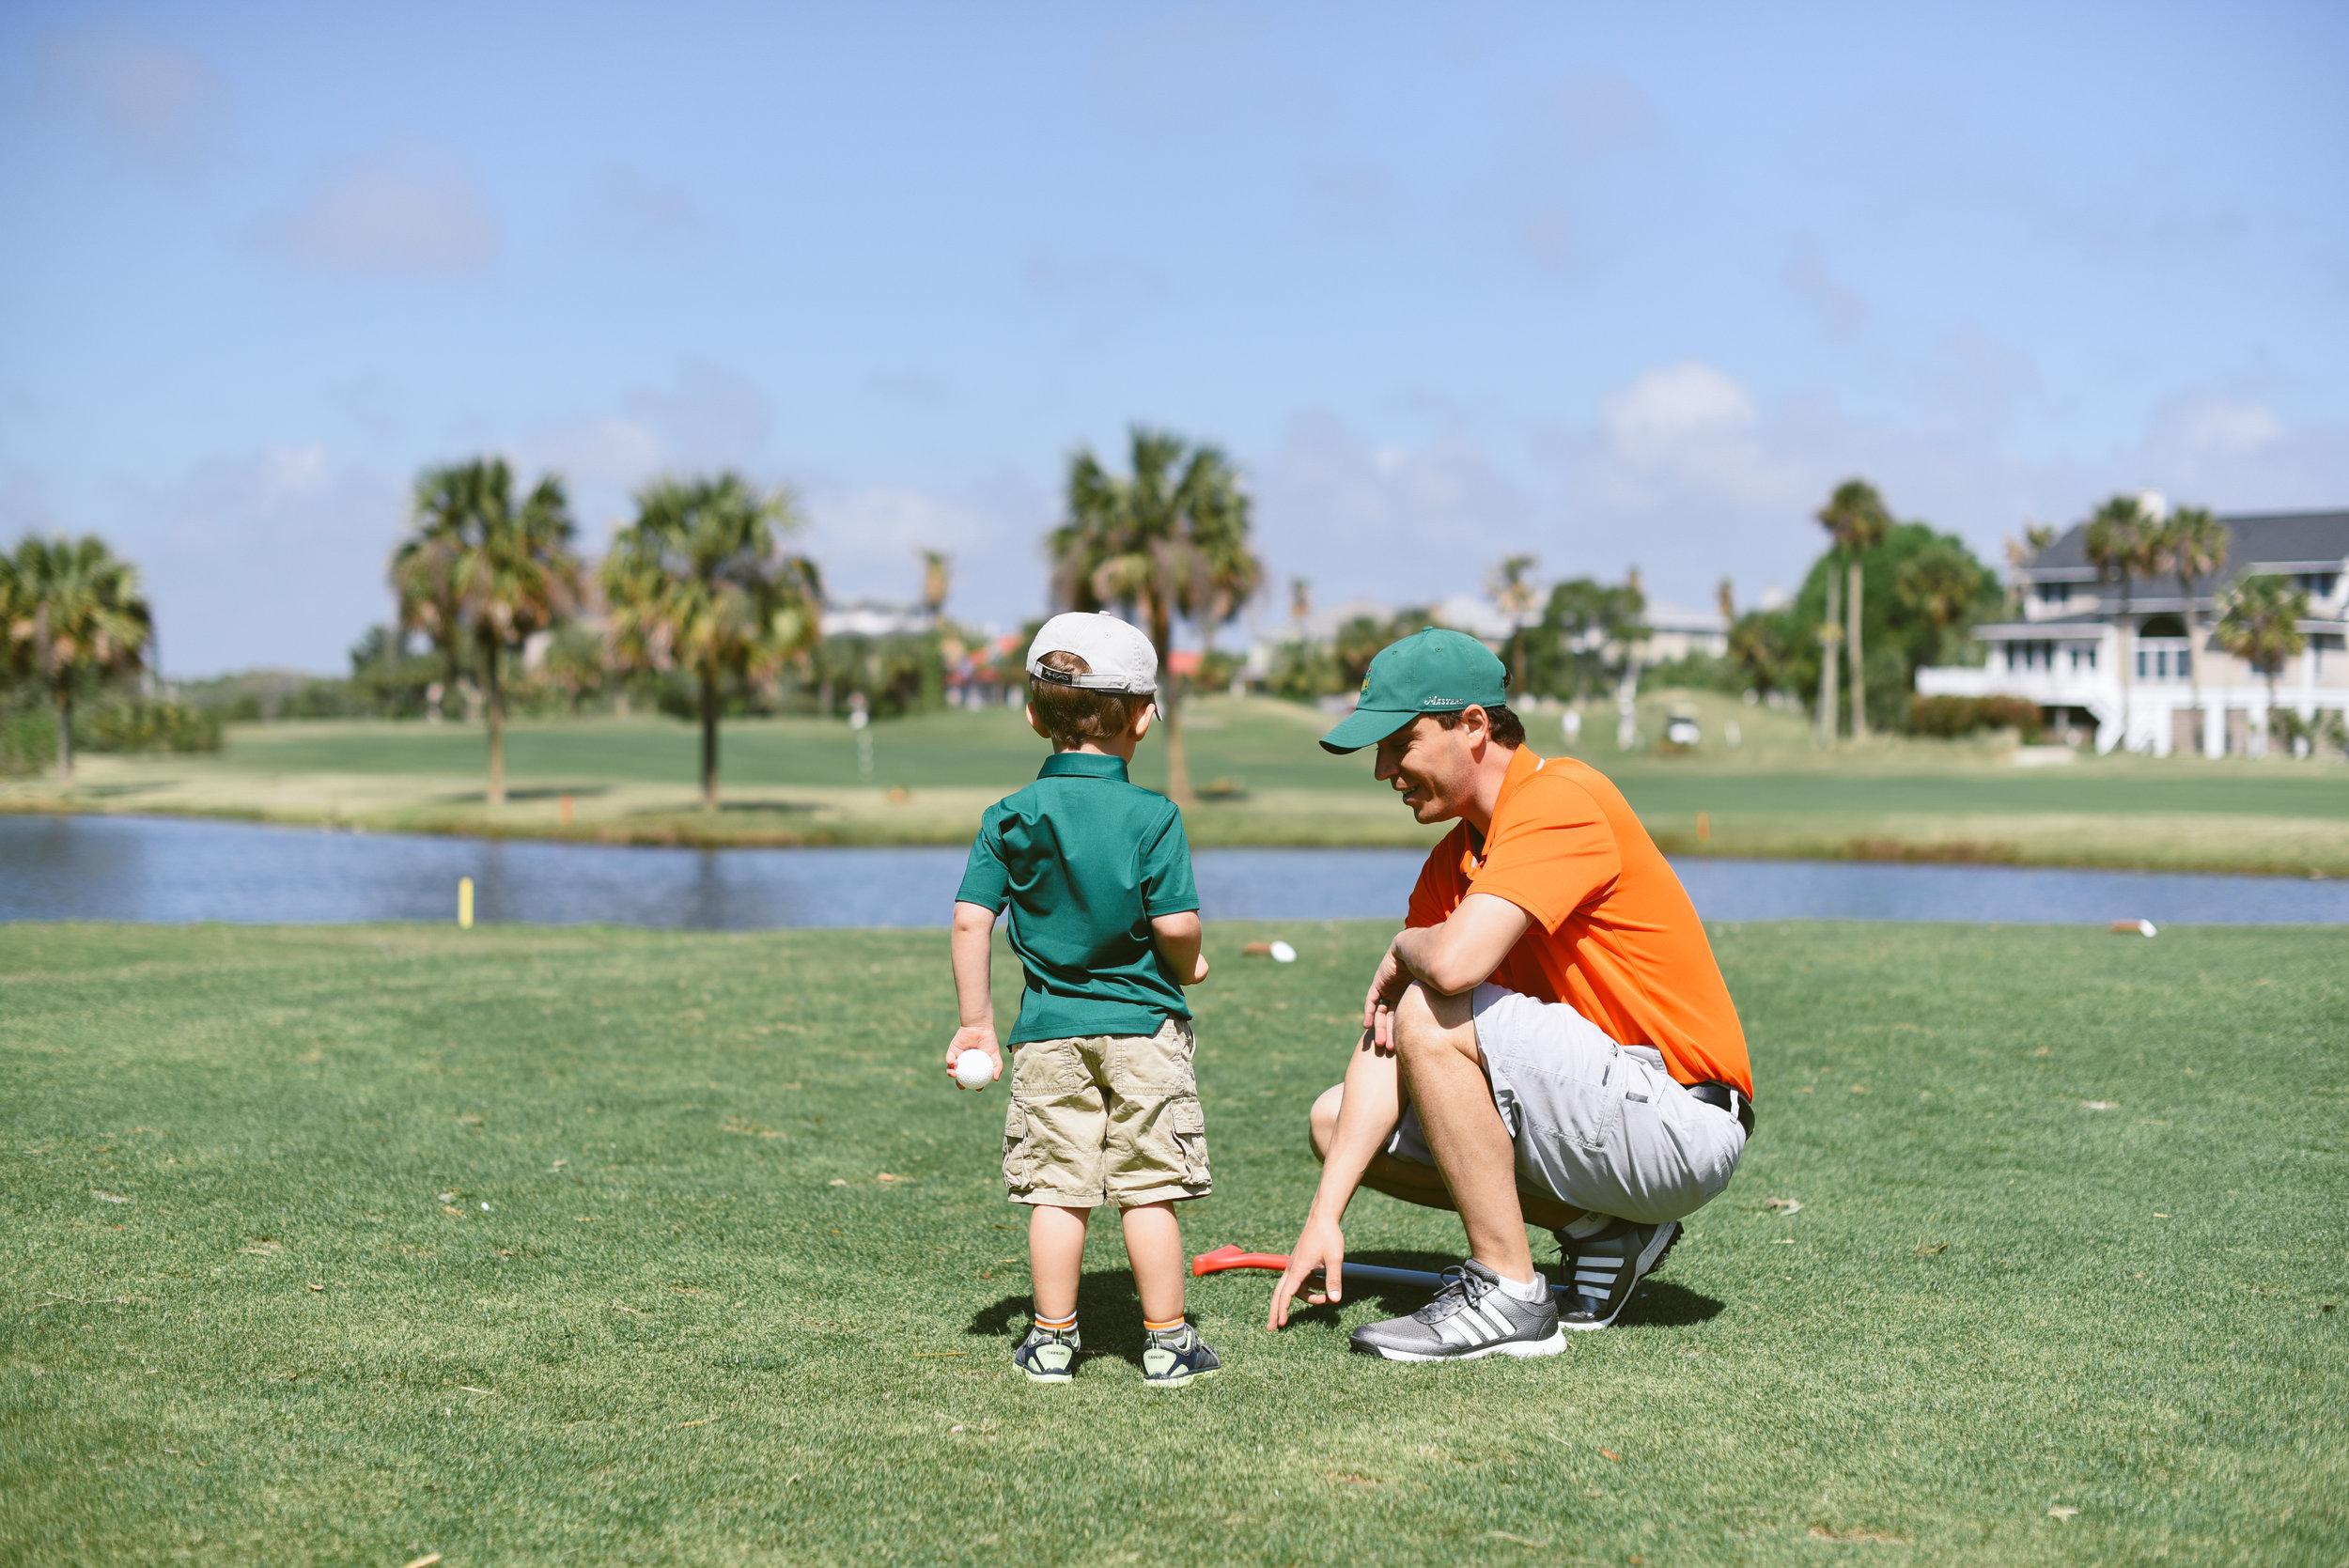 golfing (1).jpg